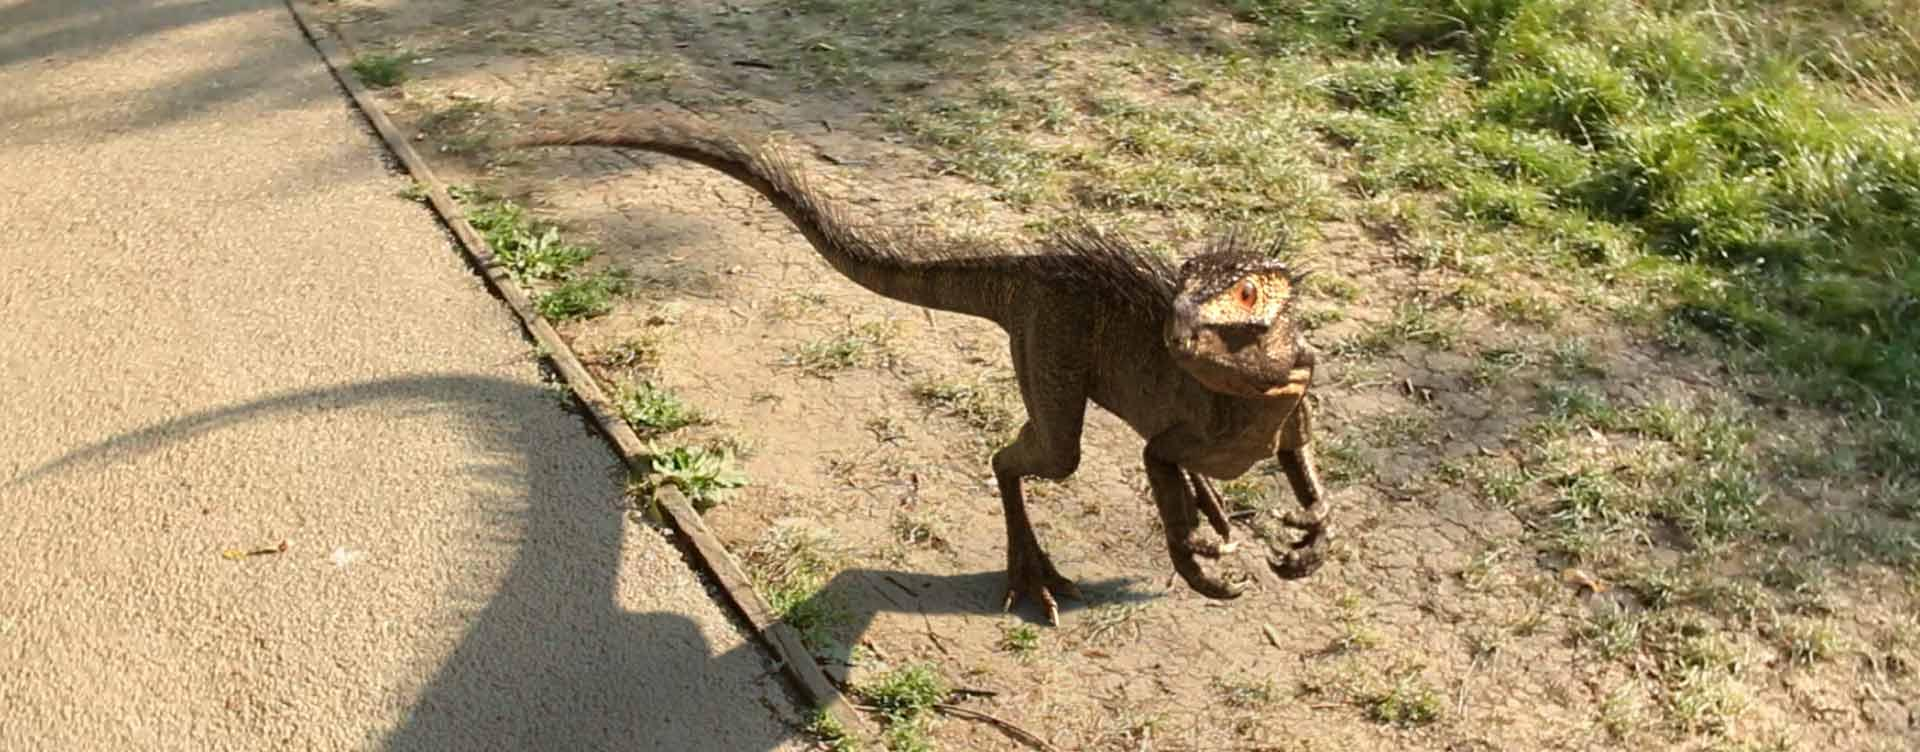 3D CG dinosaur made in Nuke